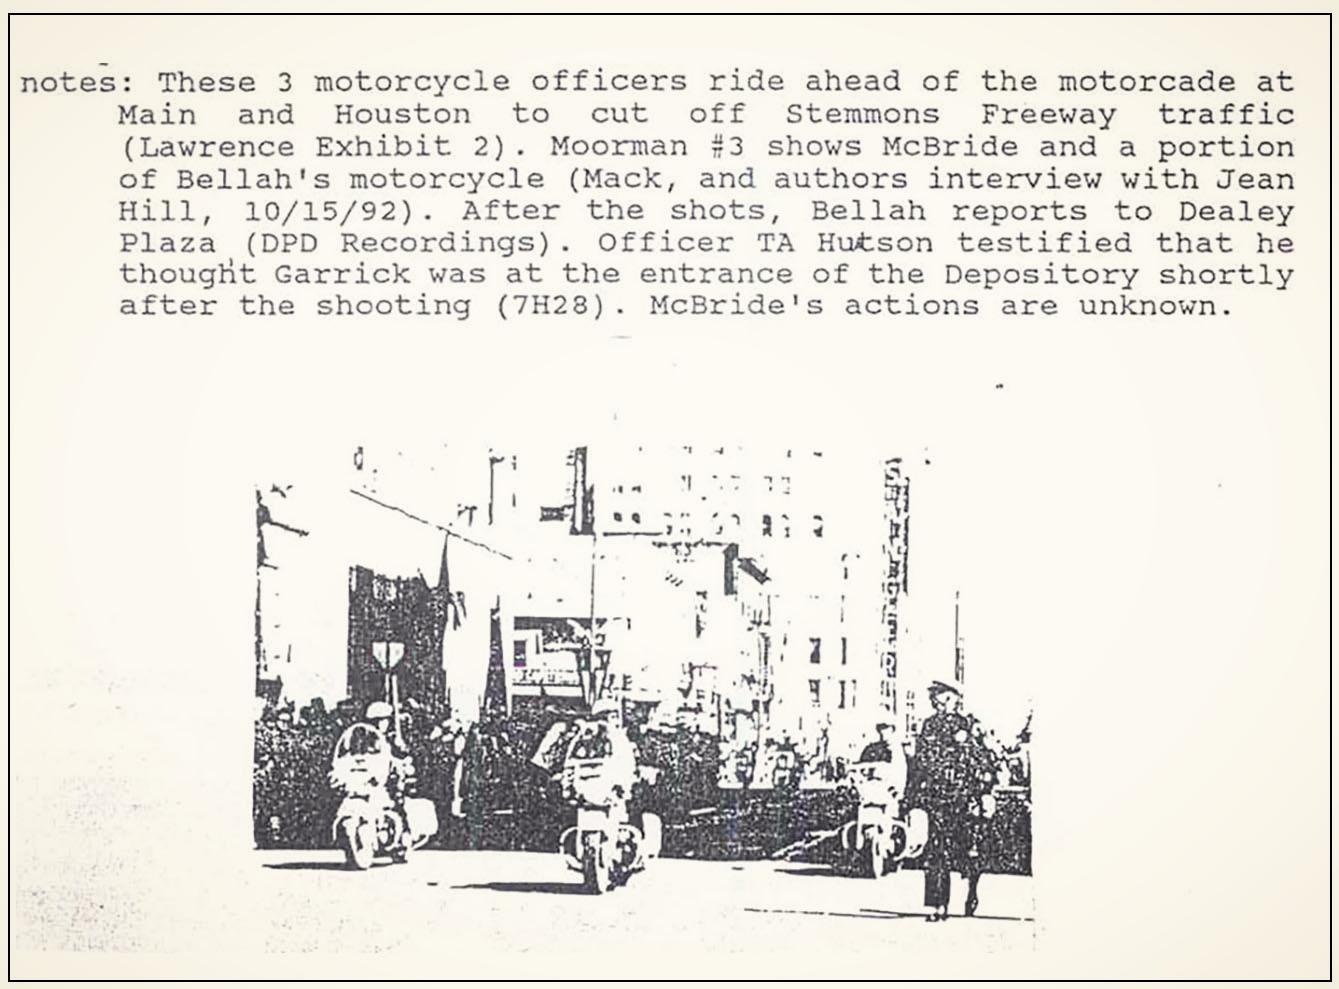 Excerpt from  Presidential Motorcade Schematic Listing – Vaughan, Todd Wayne (1993).